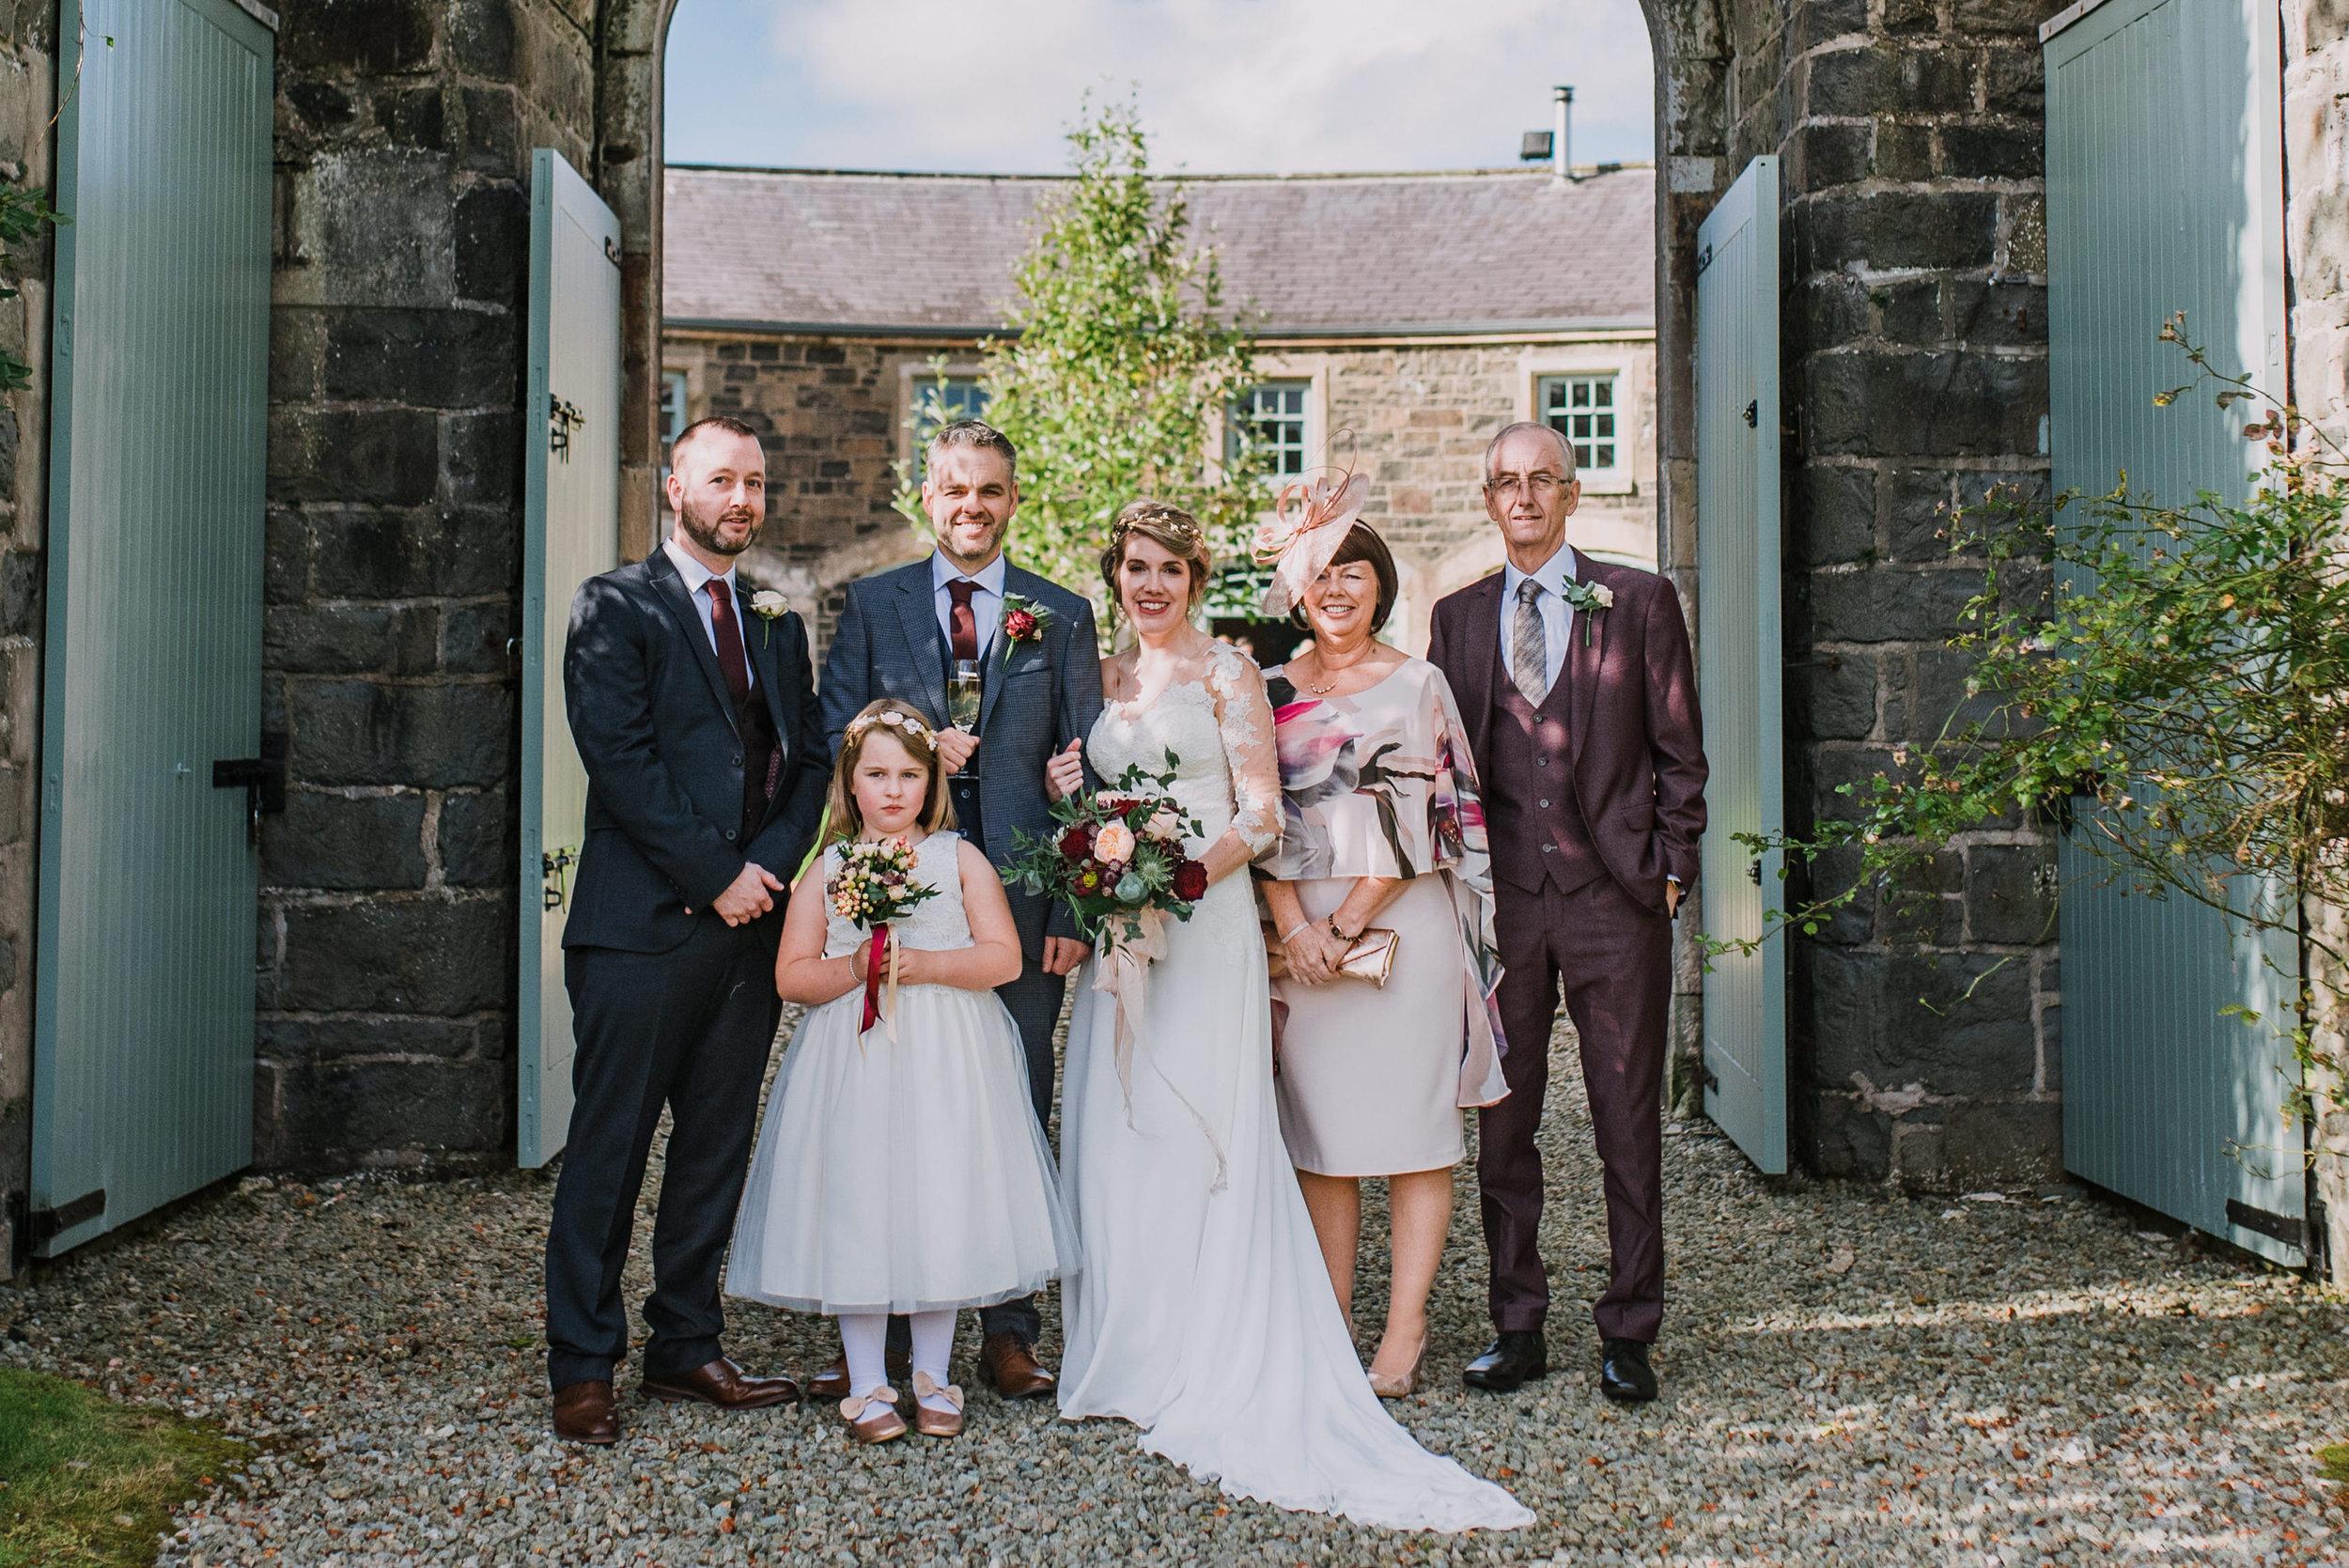 lissanoure castle wedding, northern ireland wedding photographer, romantic northern irish wedding venue, castle wedding ireland, natural wedding photography ni (78).jpg